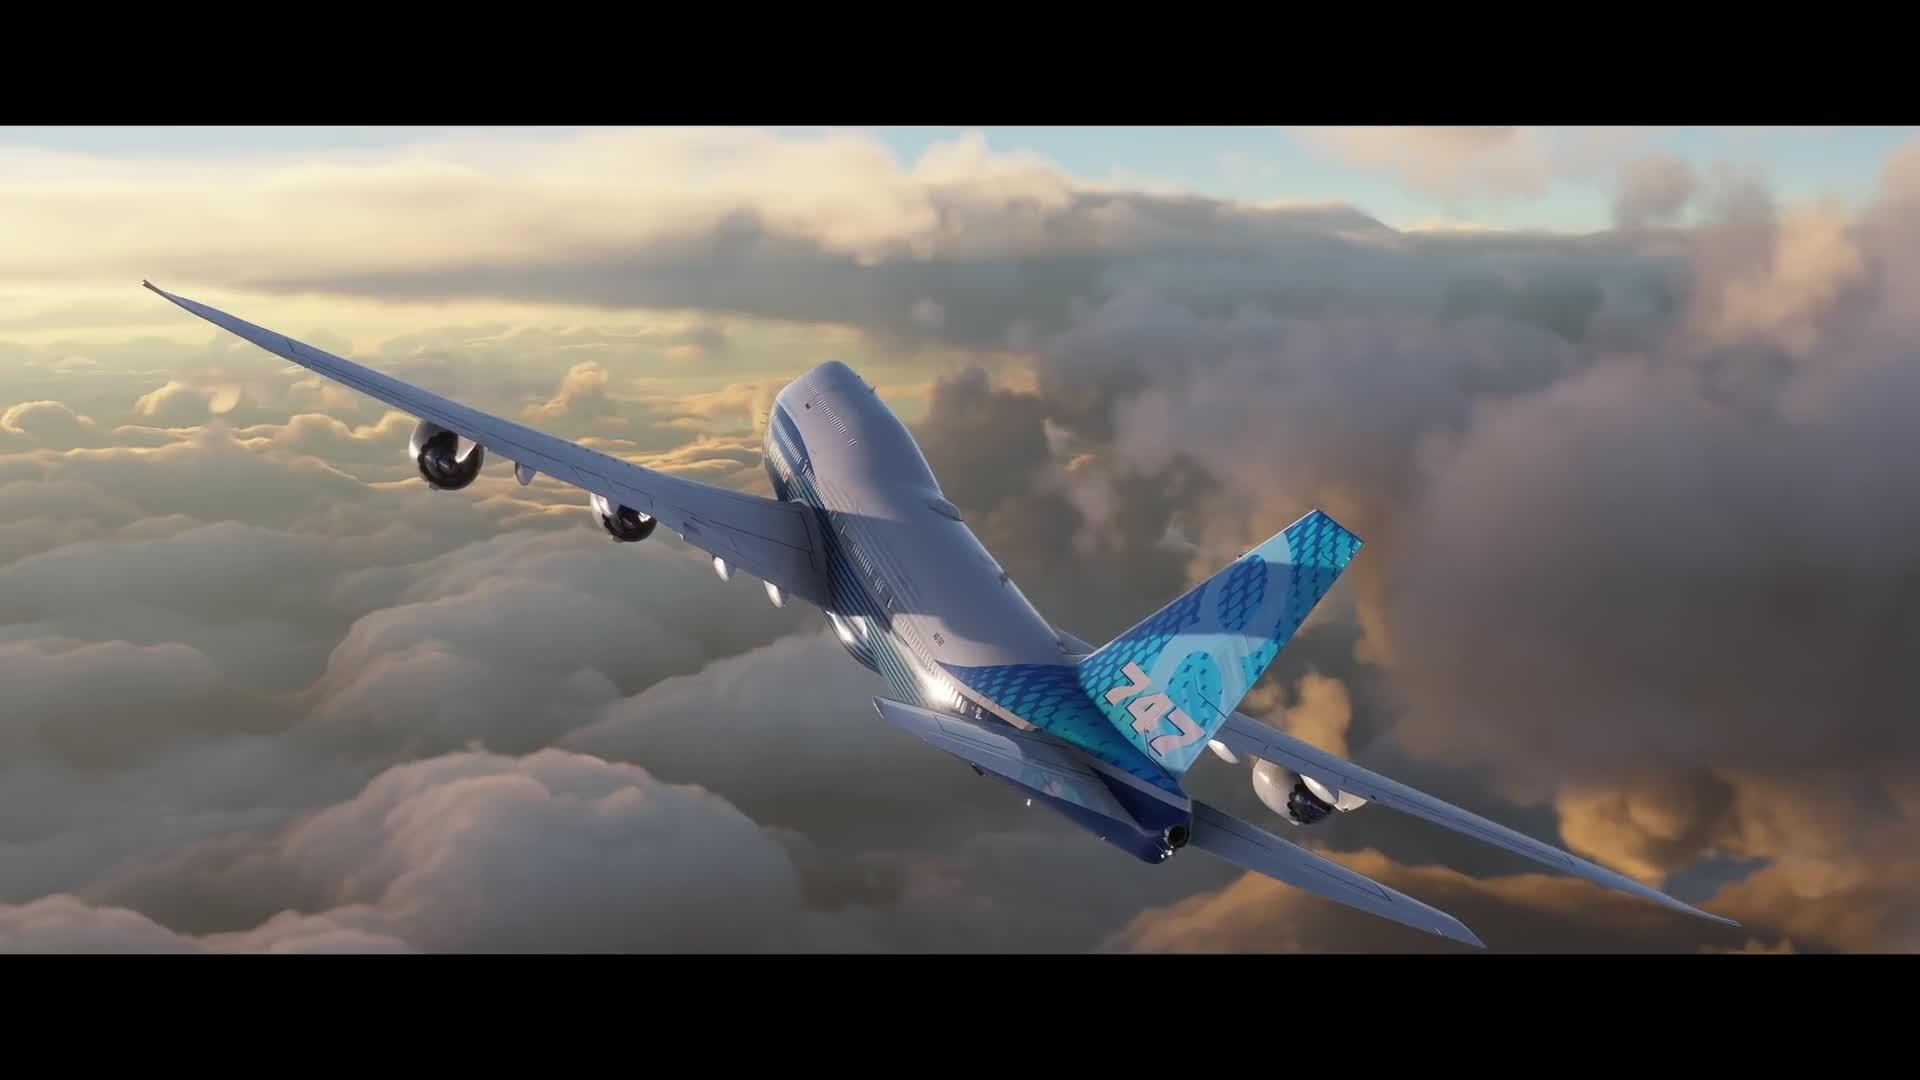 Microsoft, Simulation, flugsimulation, Flight Simulator, Microsoft Flight Simulator, X019